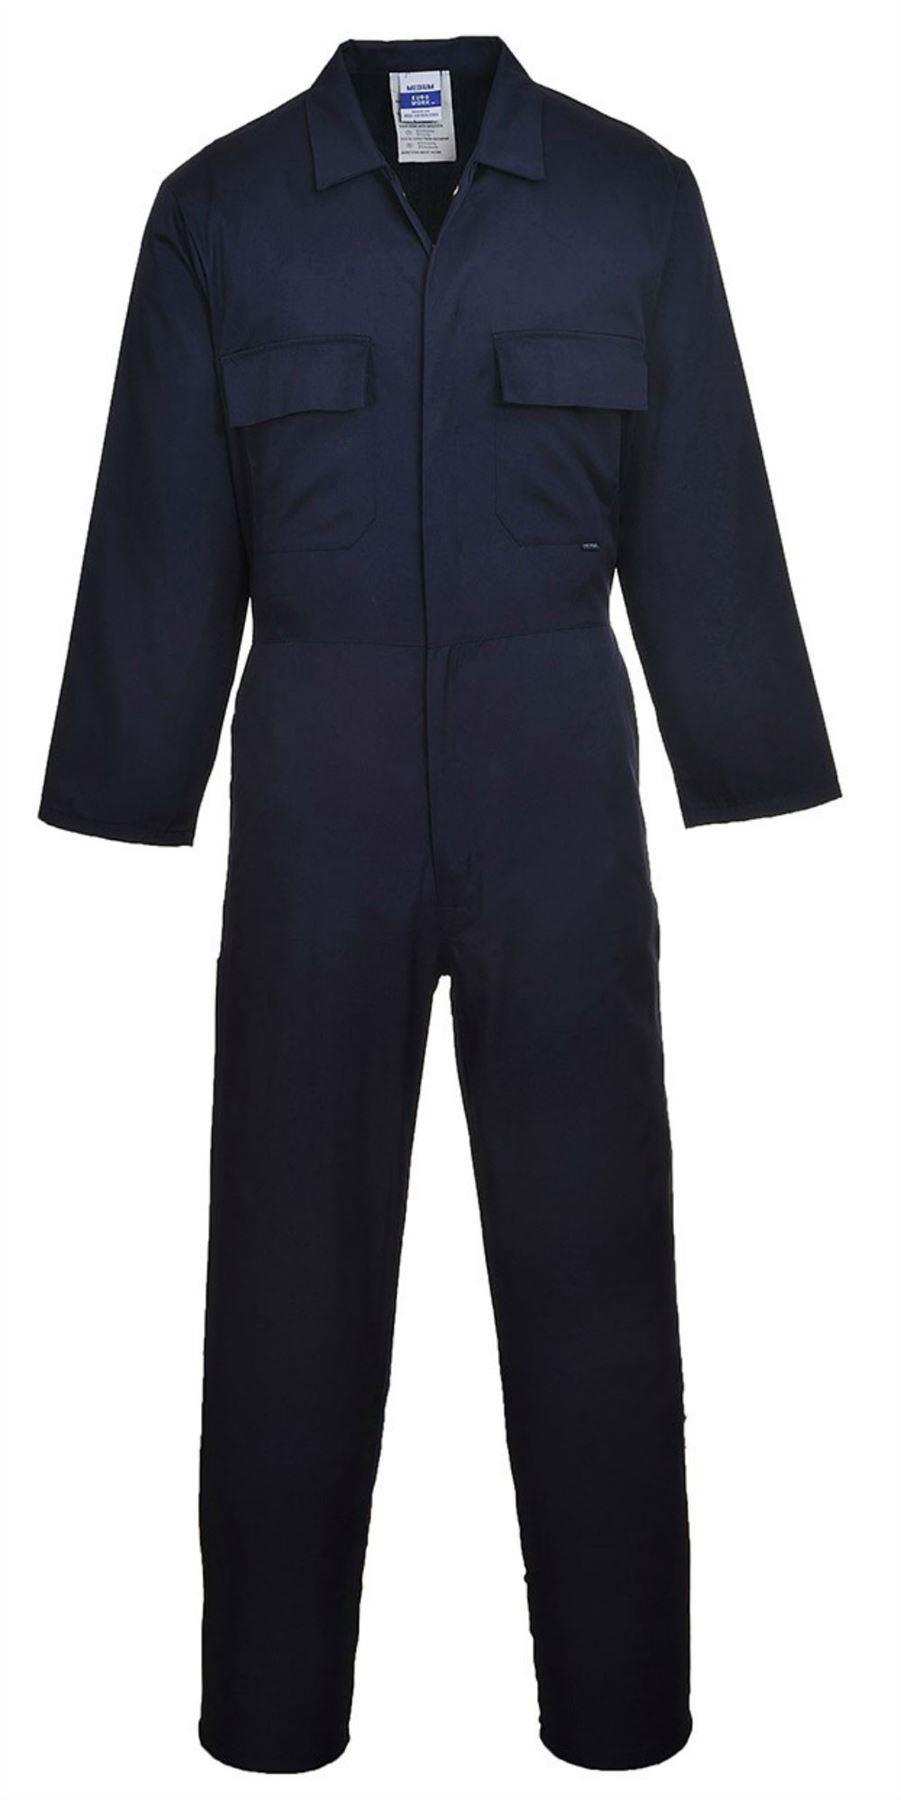 Portwest Standard Workwear Overalls - Navy 5XL